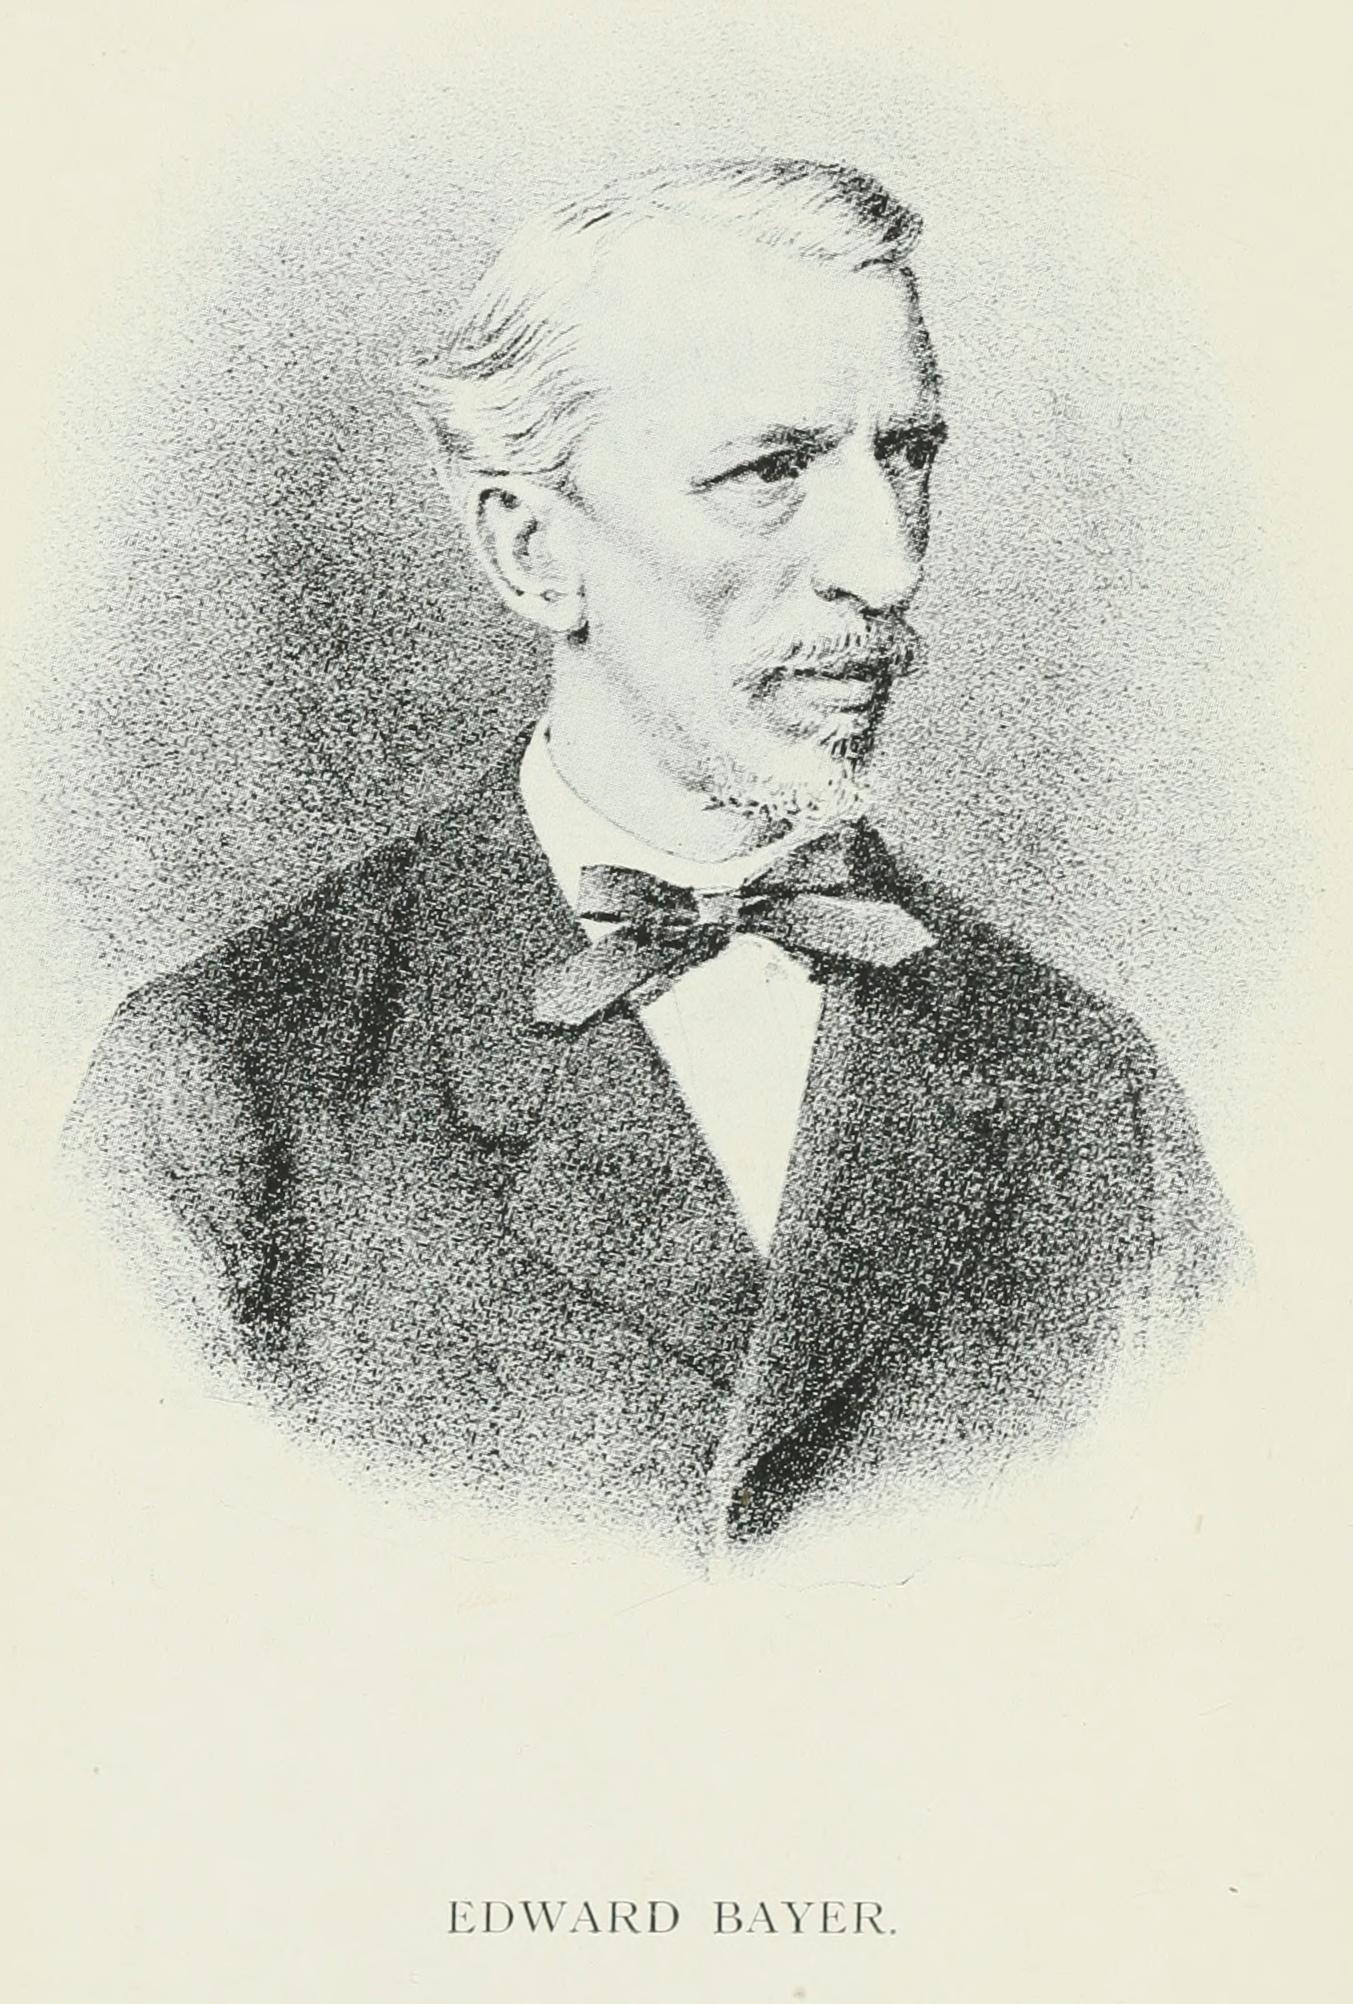 Portrait of Eduard Bayer